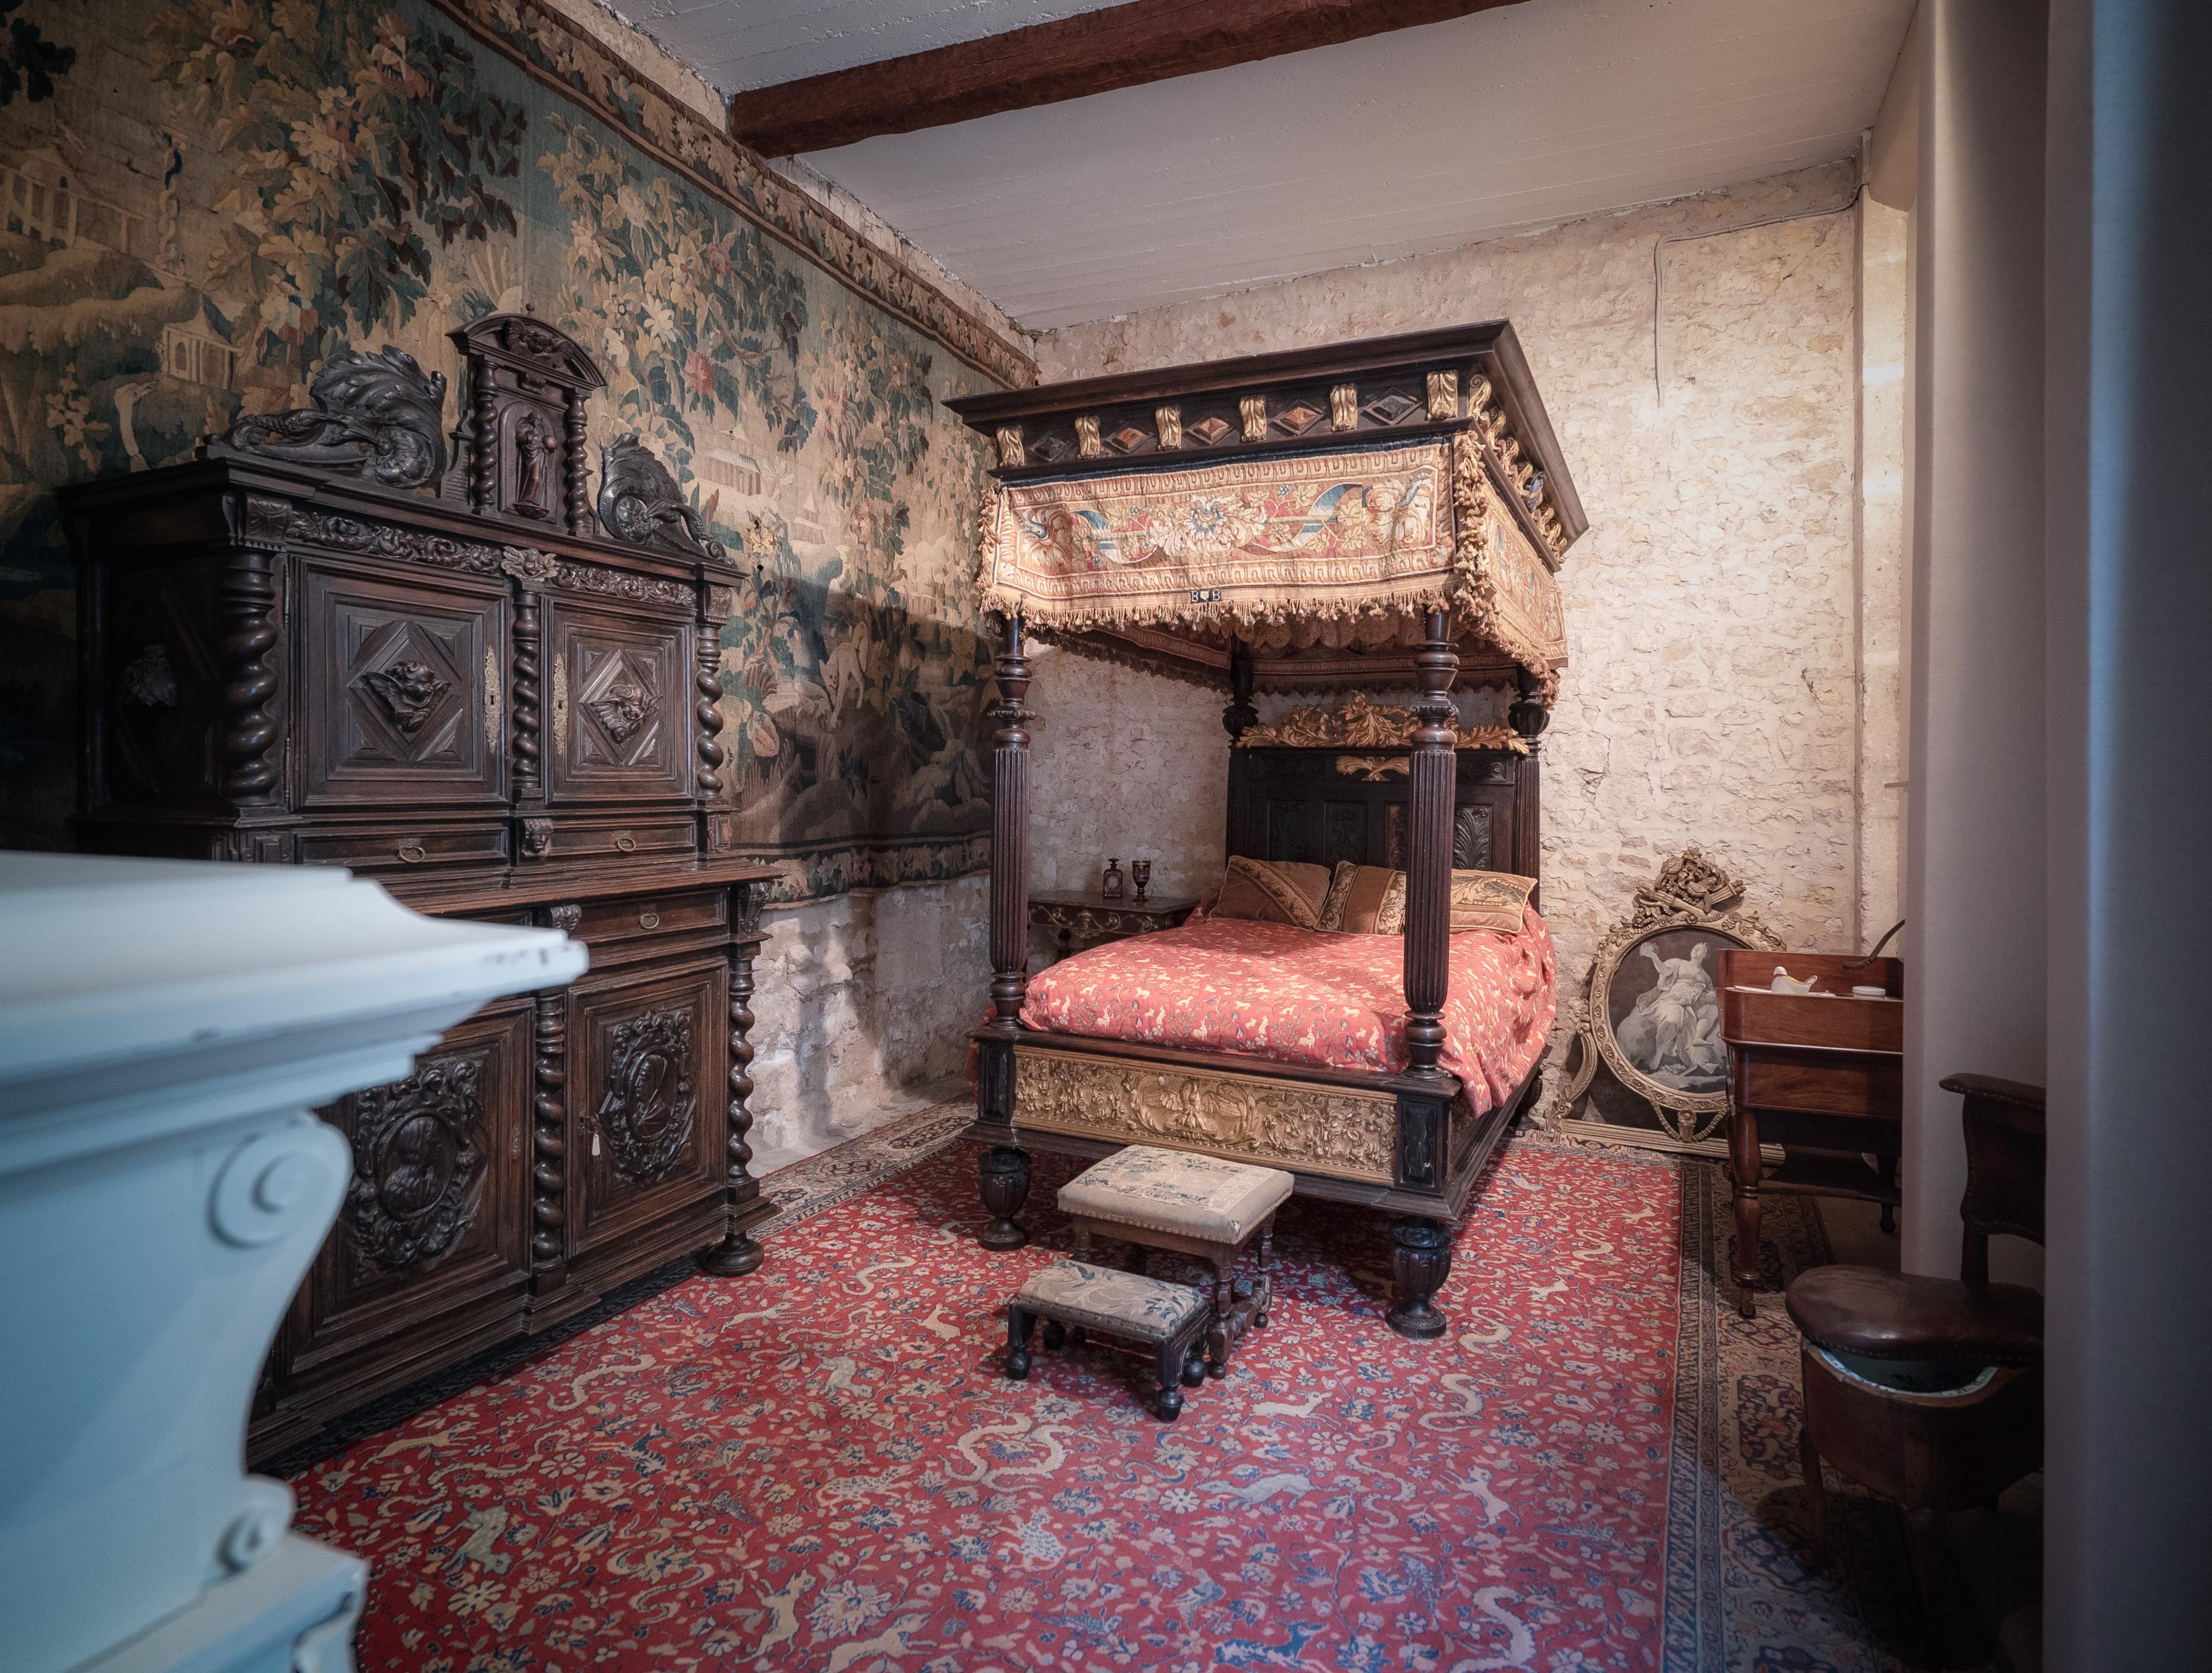 Bedroom in the castle of Terre Neuve